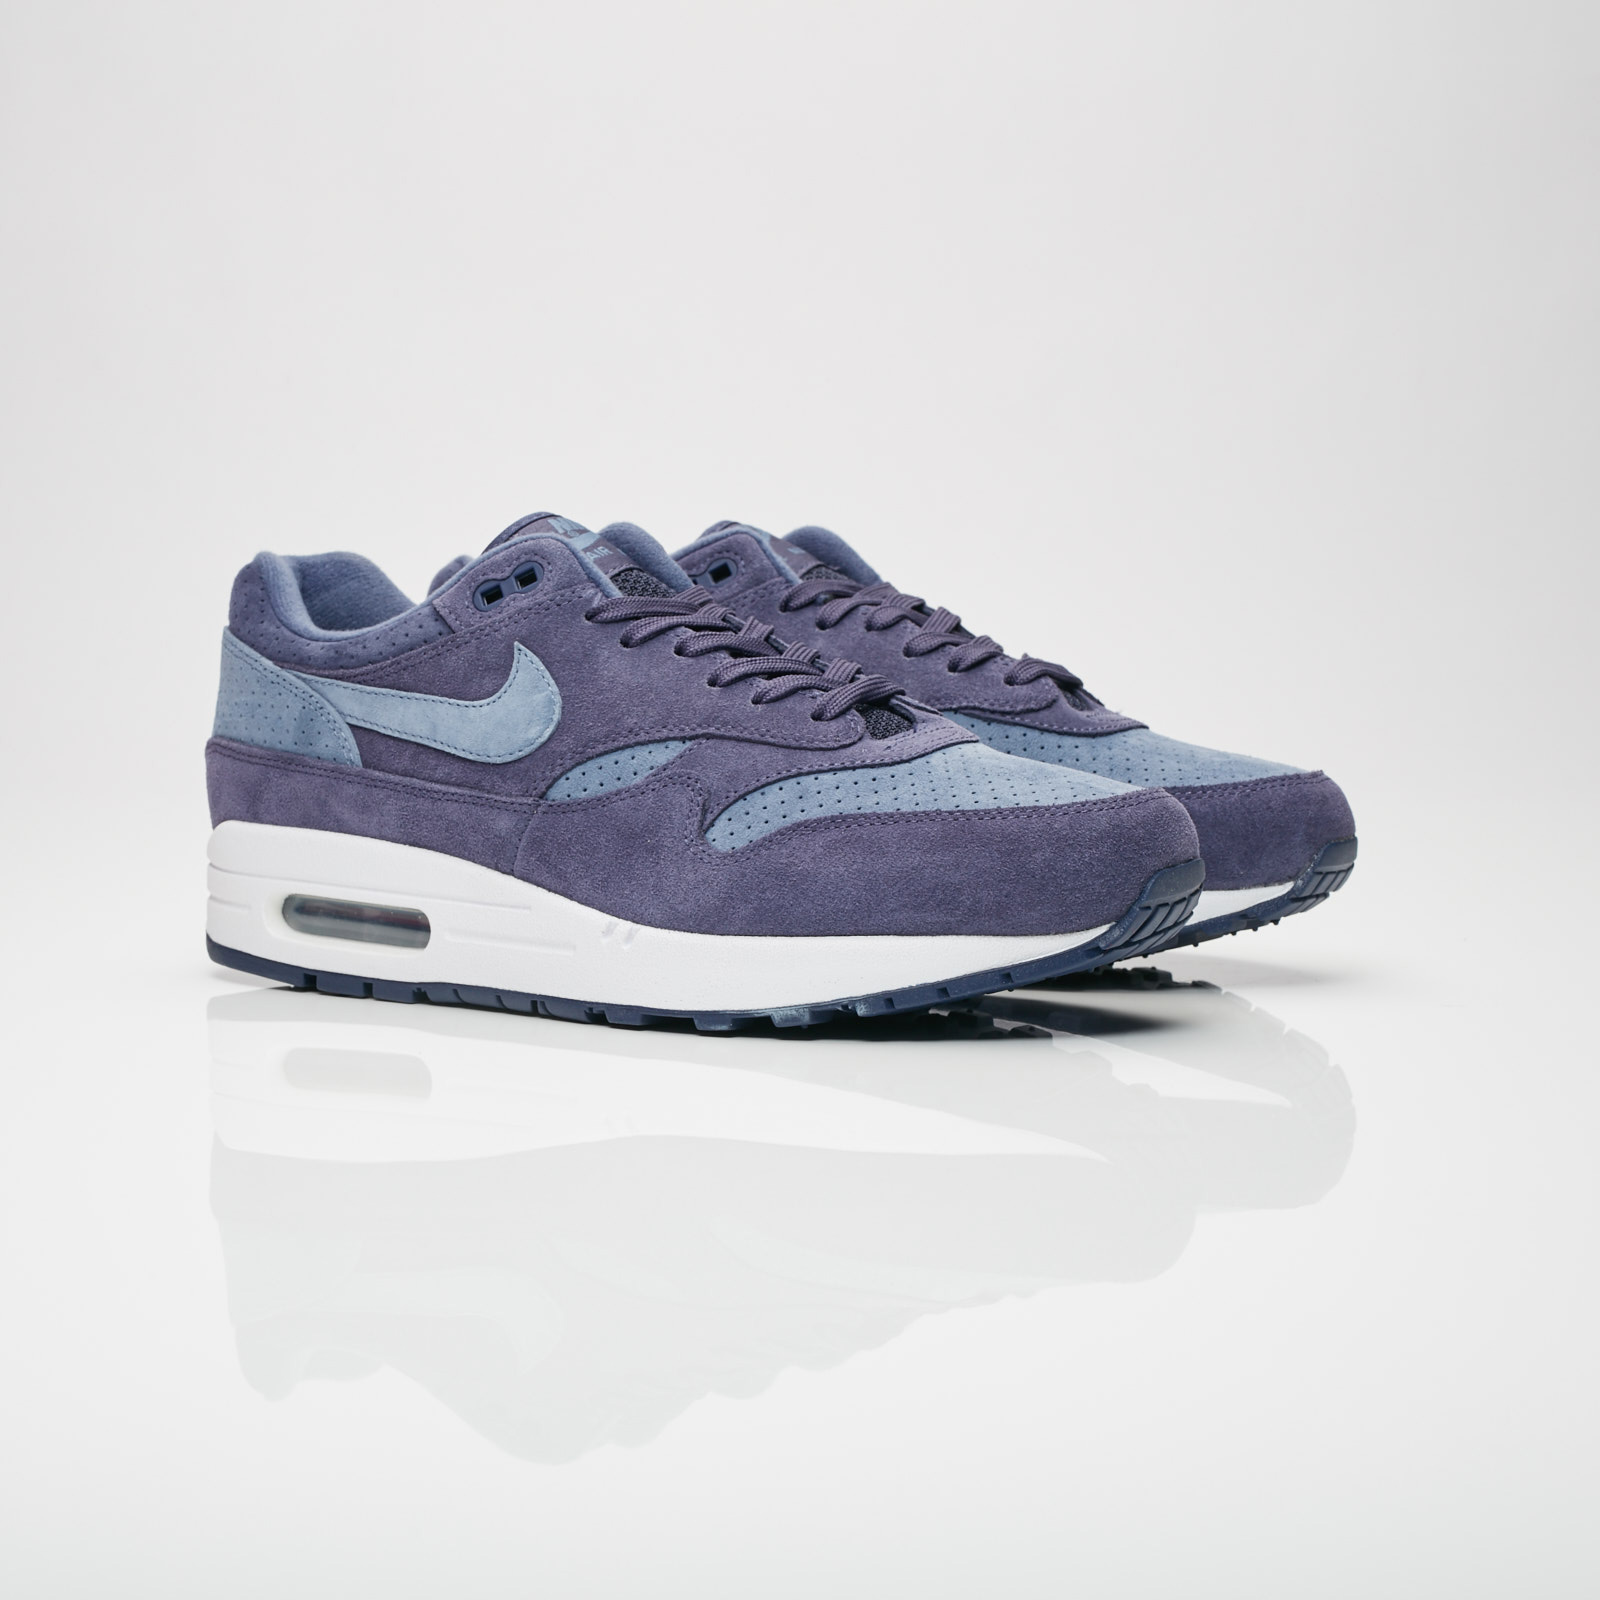 quality design 51581 4c1ff Nike Sportswear Air Max 1 Premium